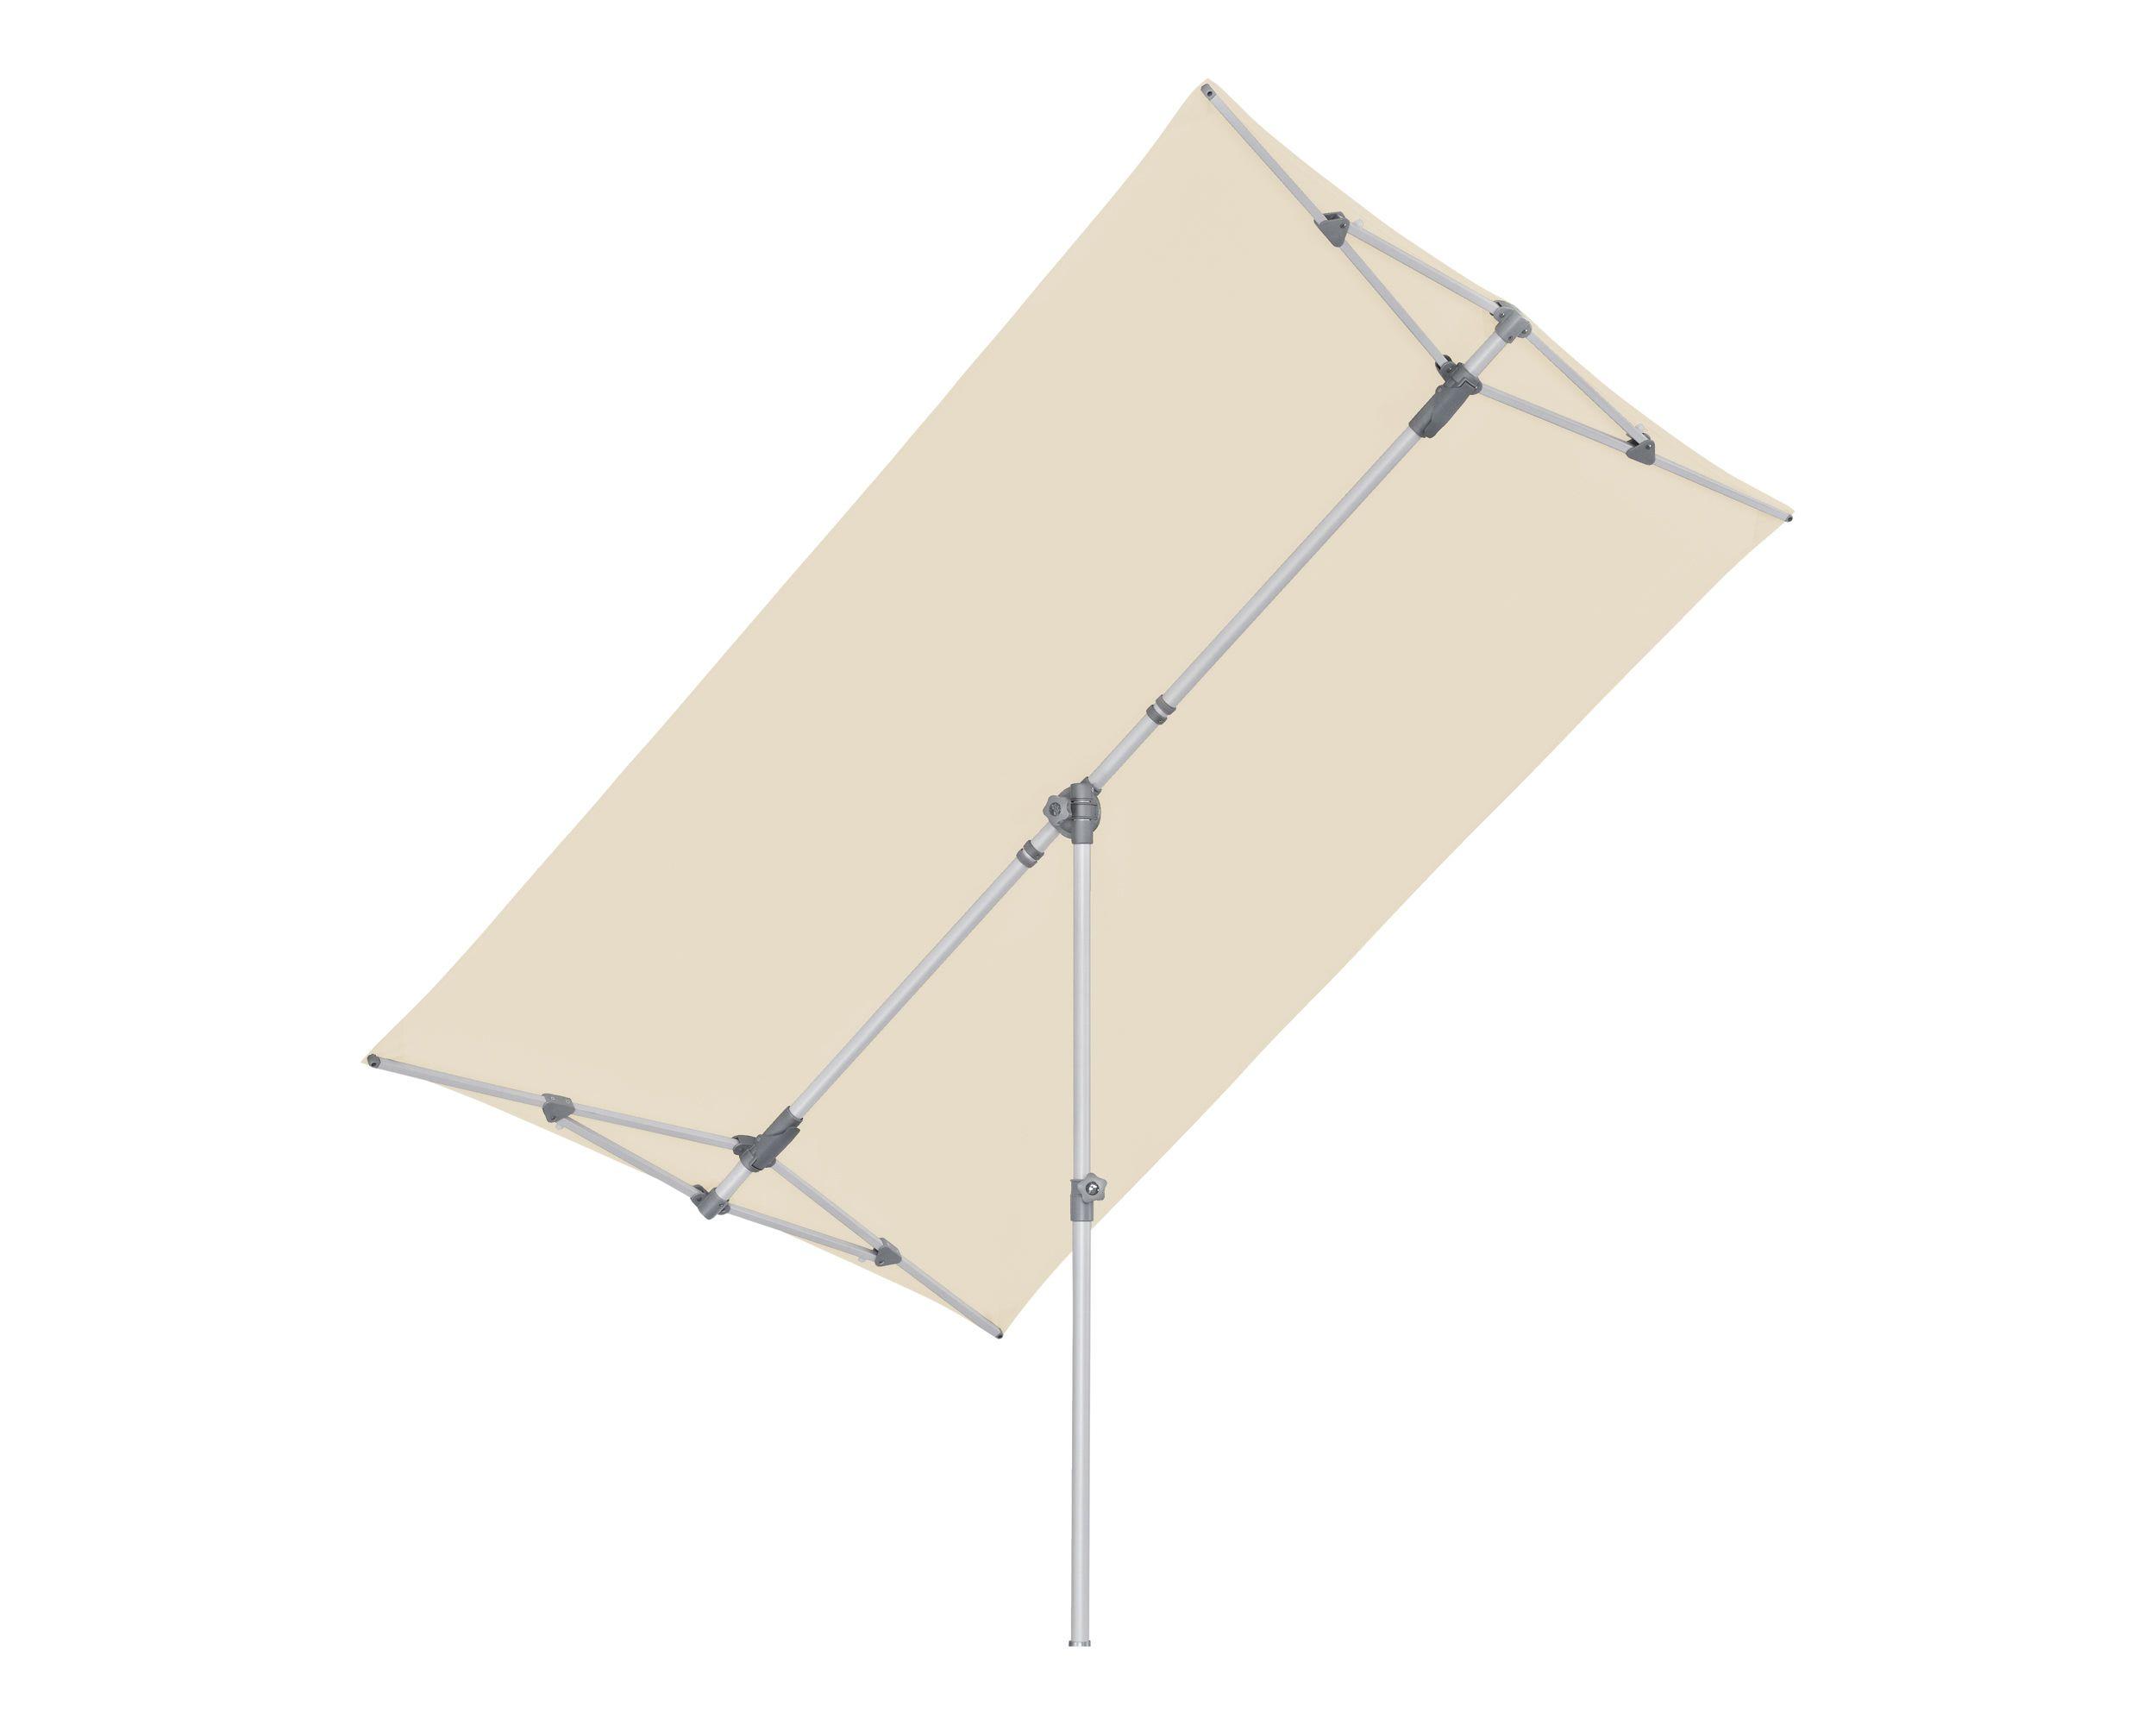 Sonnenschirm Flex-Roof, 150x210 cm